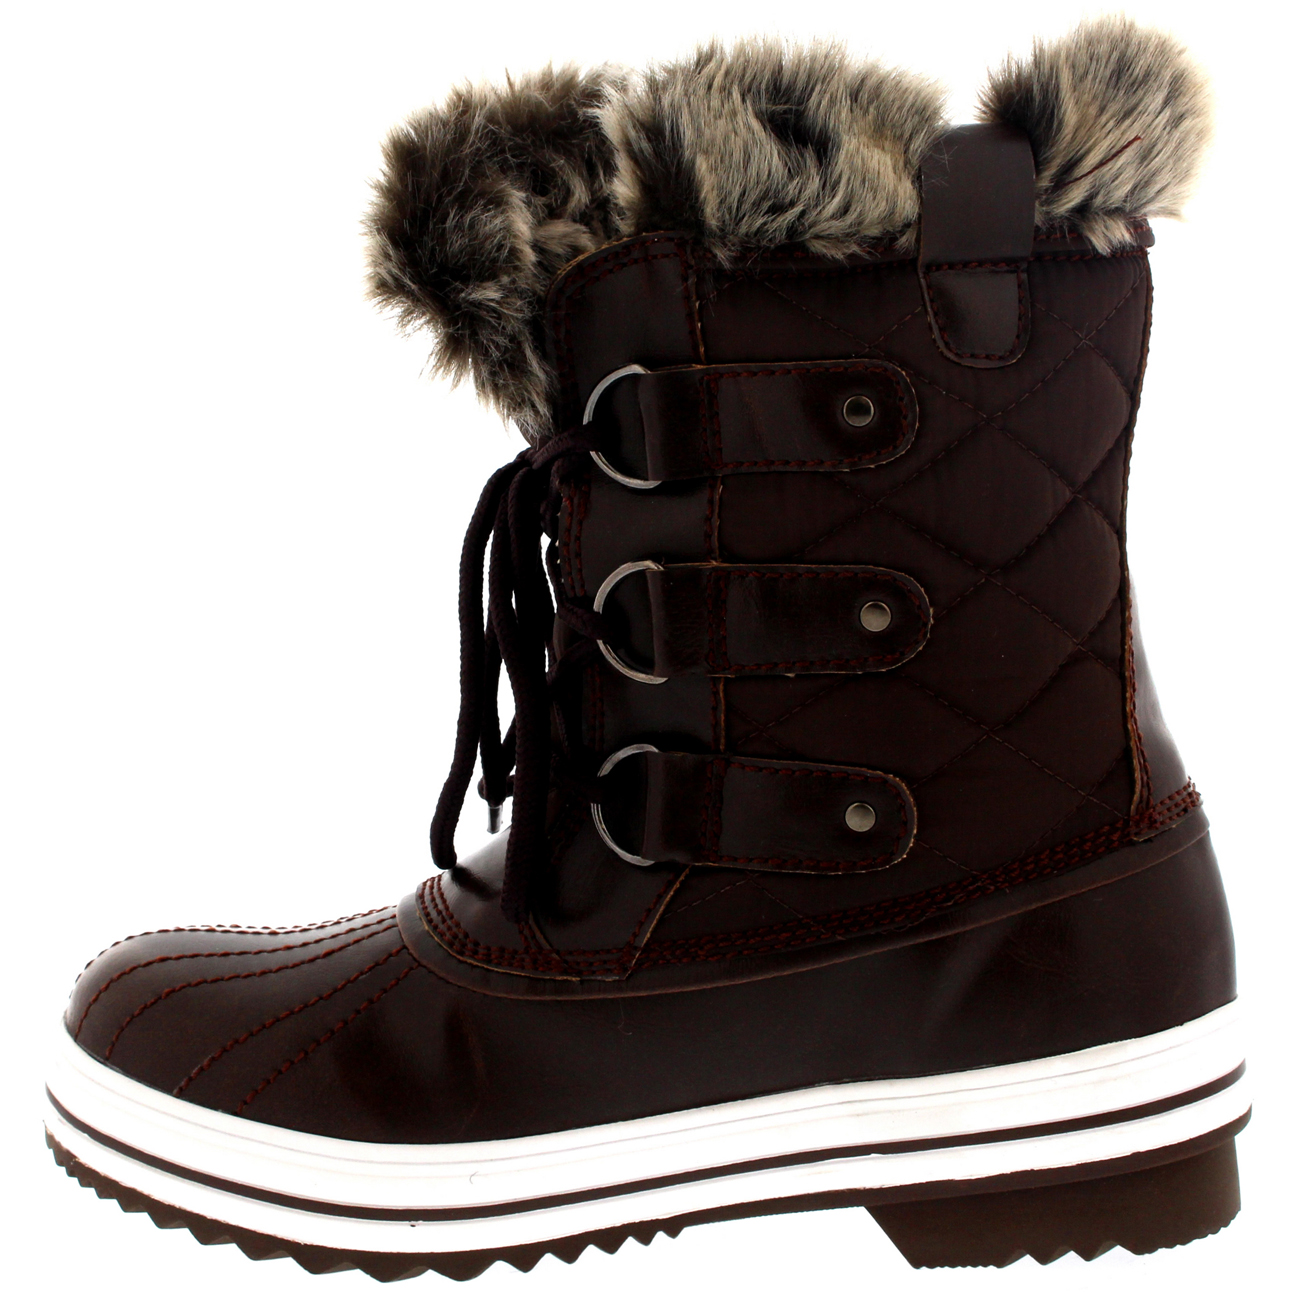 5a24d883902 Womens Snow Boot Nylon Short Winter Snow Fur Rain Warm Waterproof ...